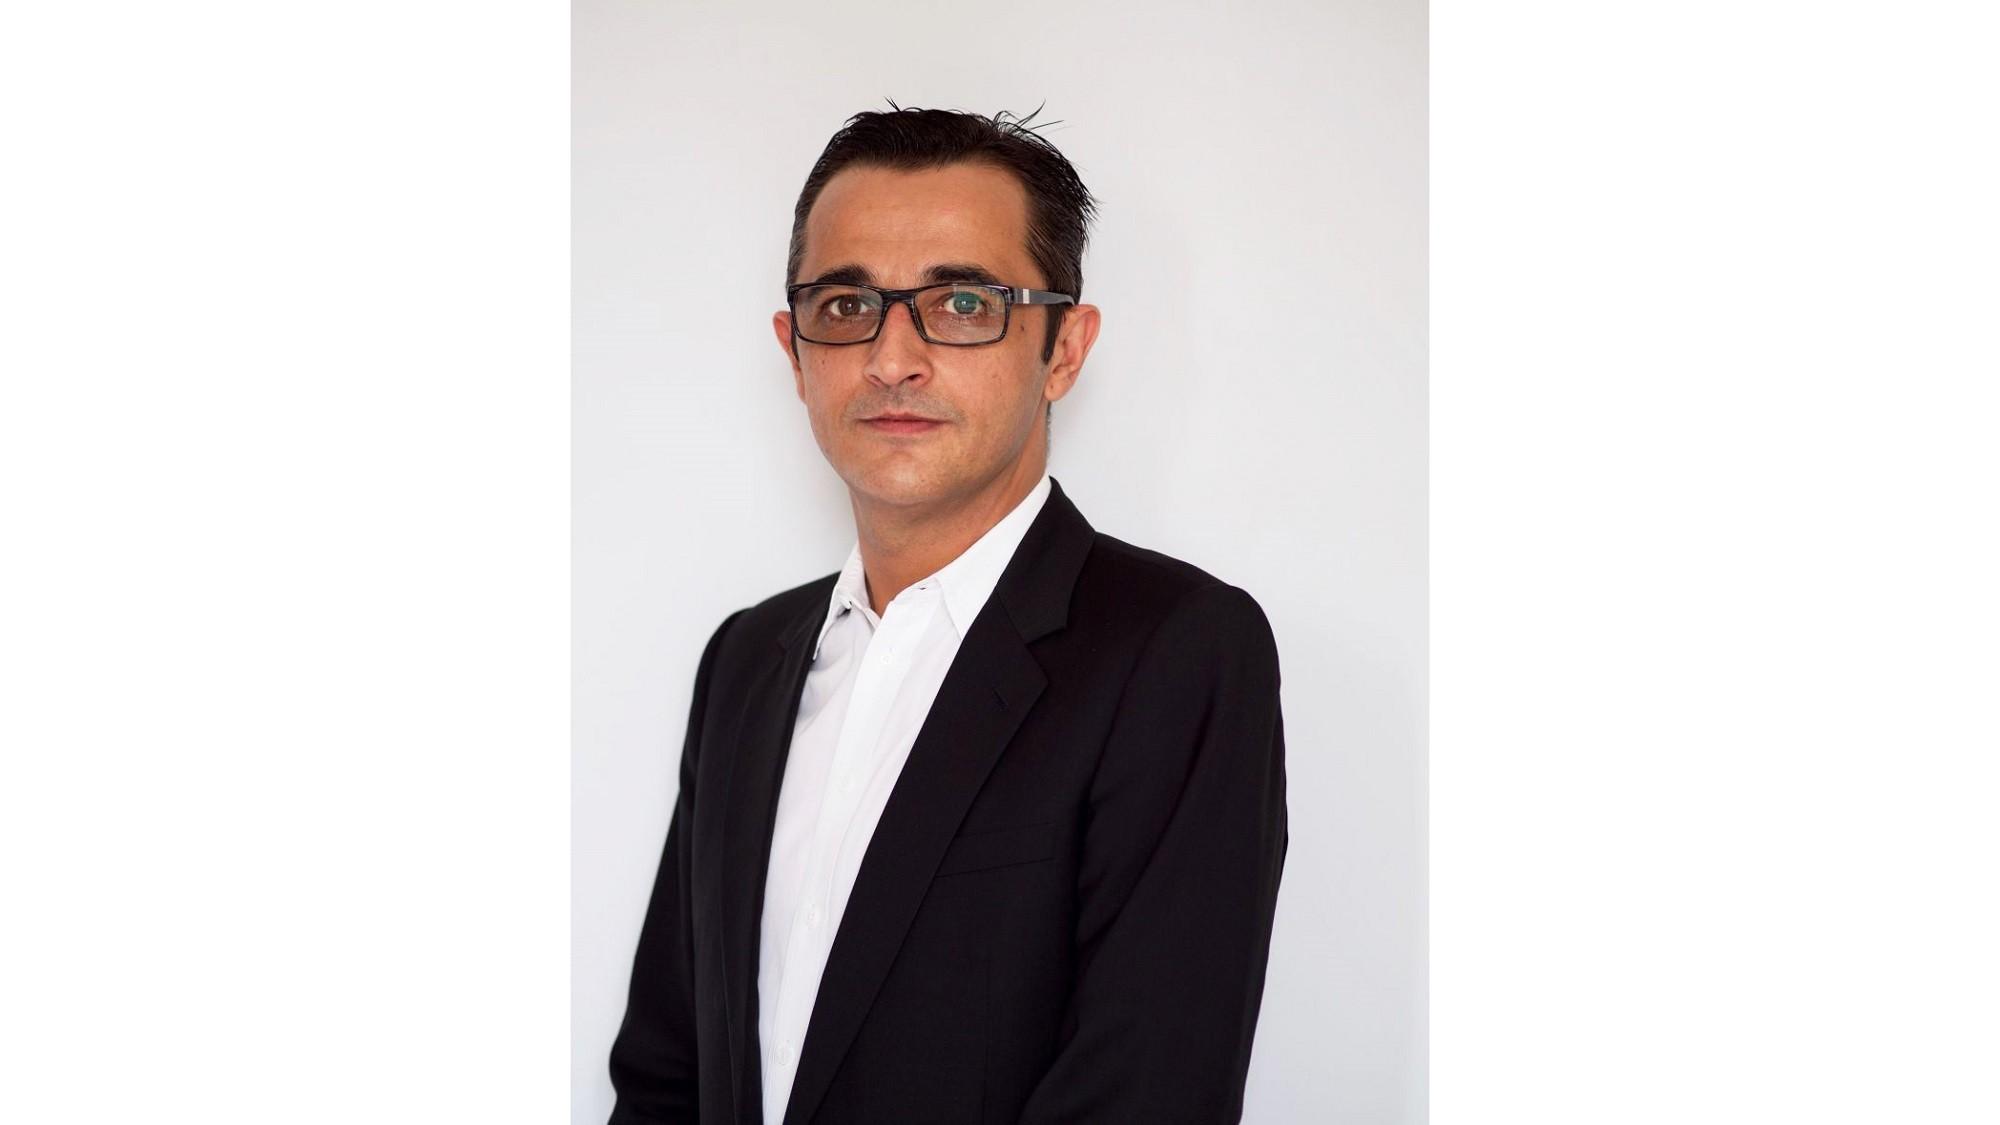 Jerome Chevrier appointment - SPAR中国任命新总经理 谢夫林